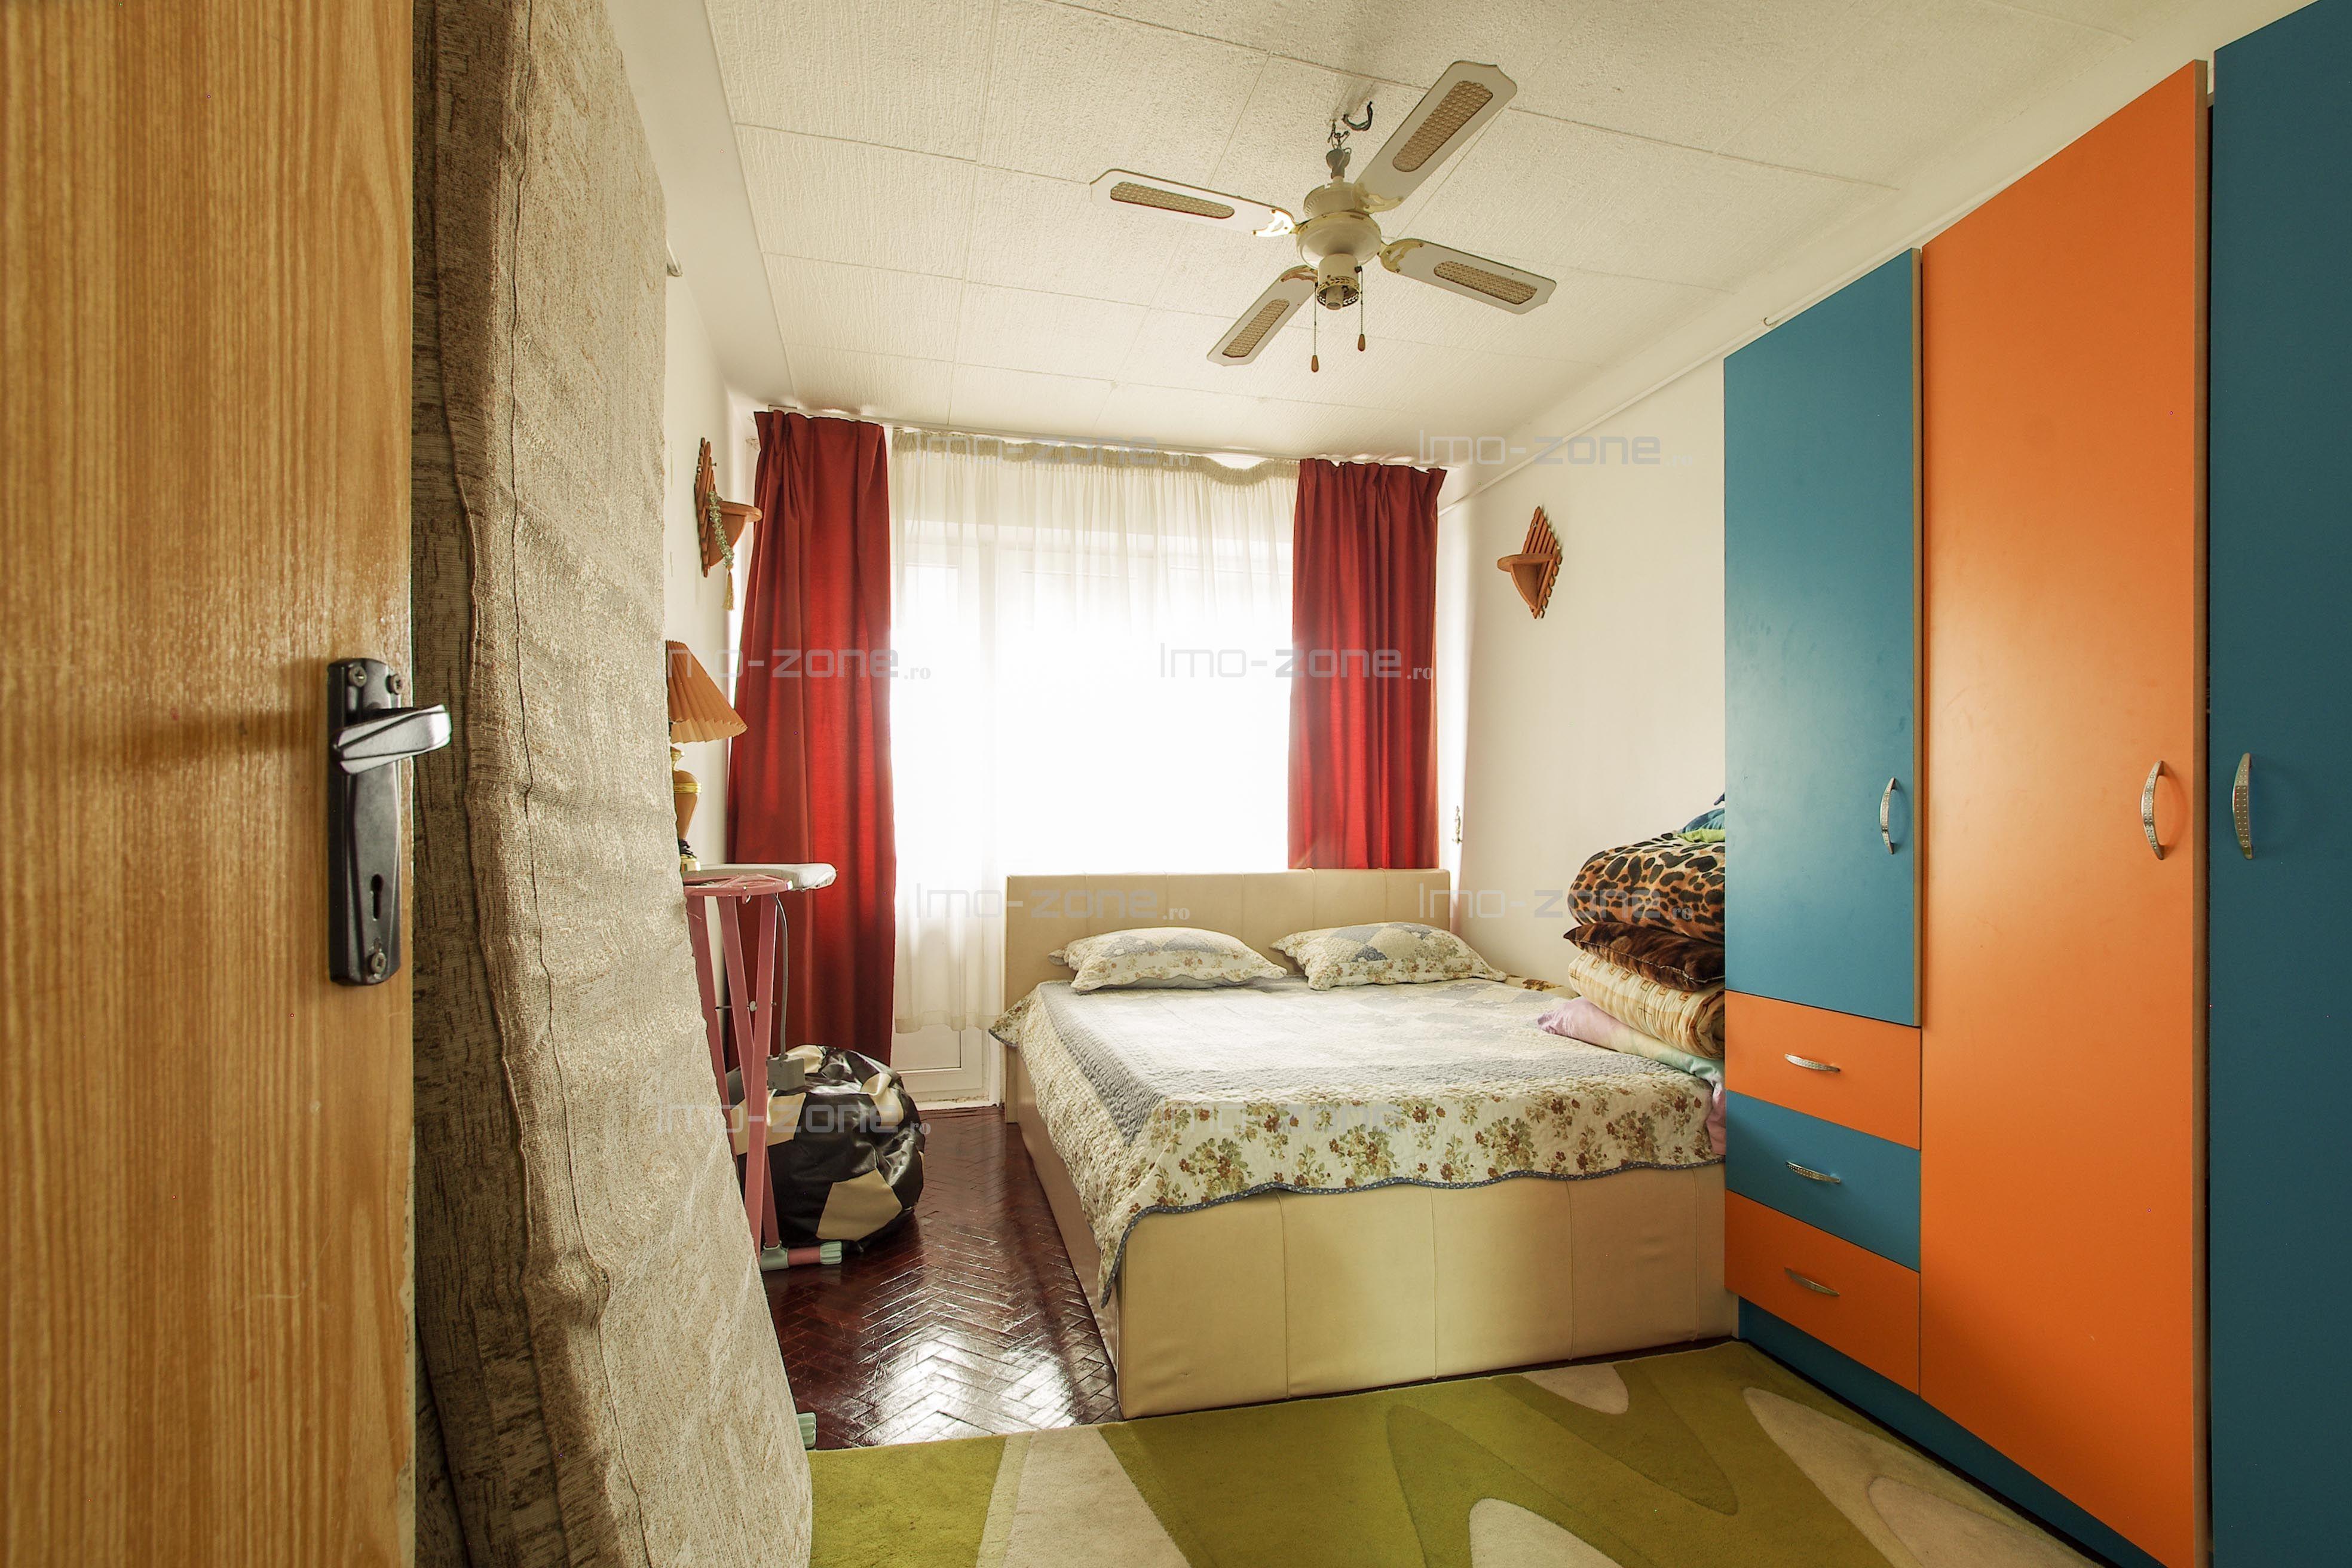 Drumul Taberei, 3 camere 2 balcoane, 72 mp, Bd. Timisoara